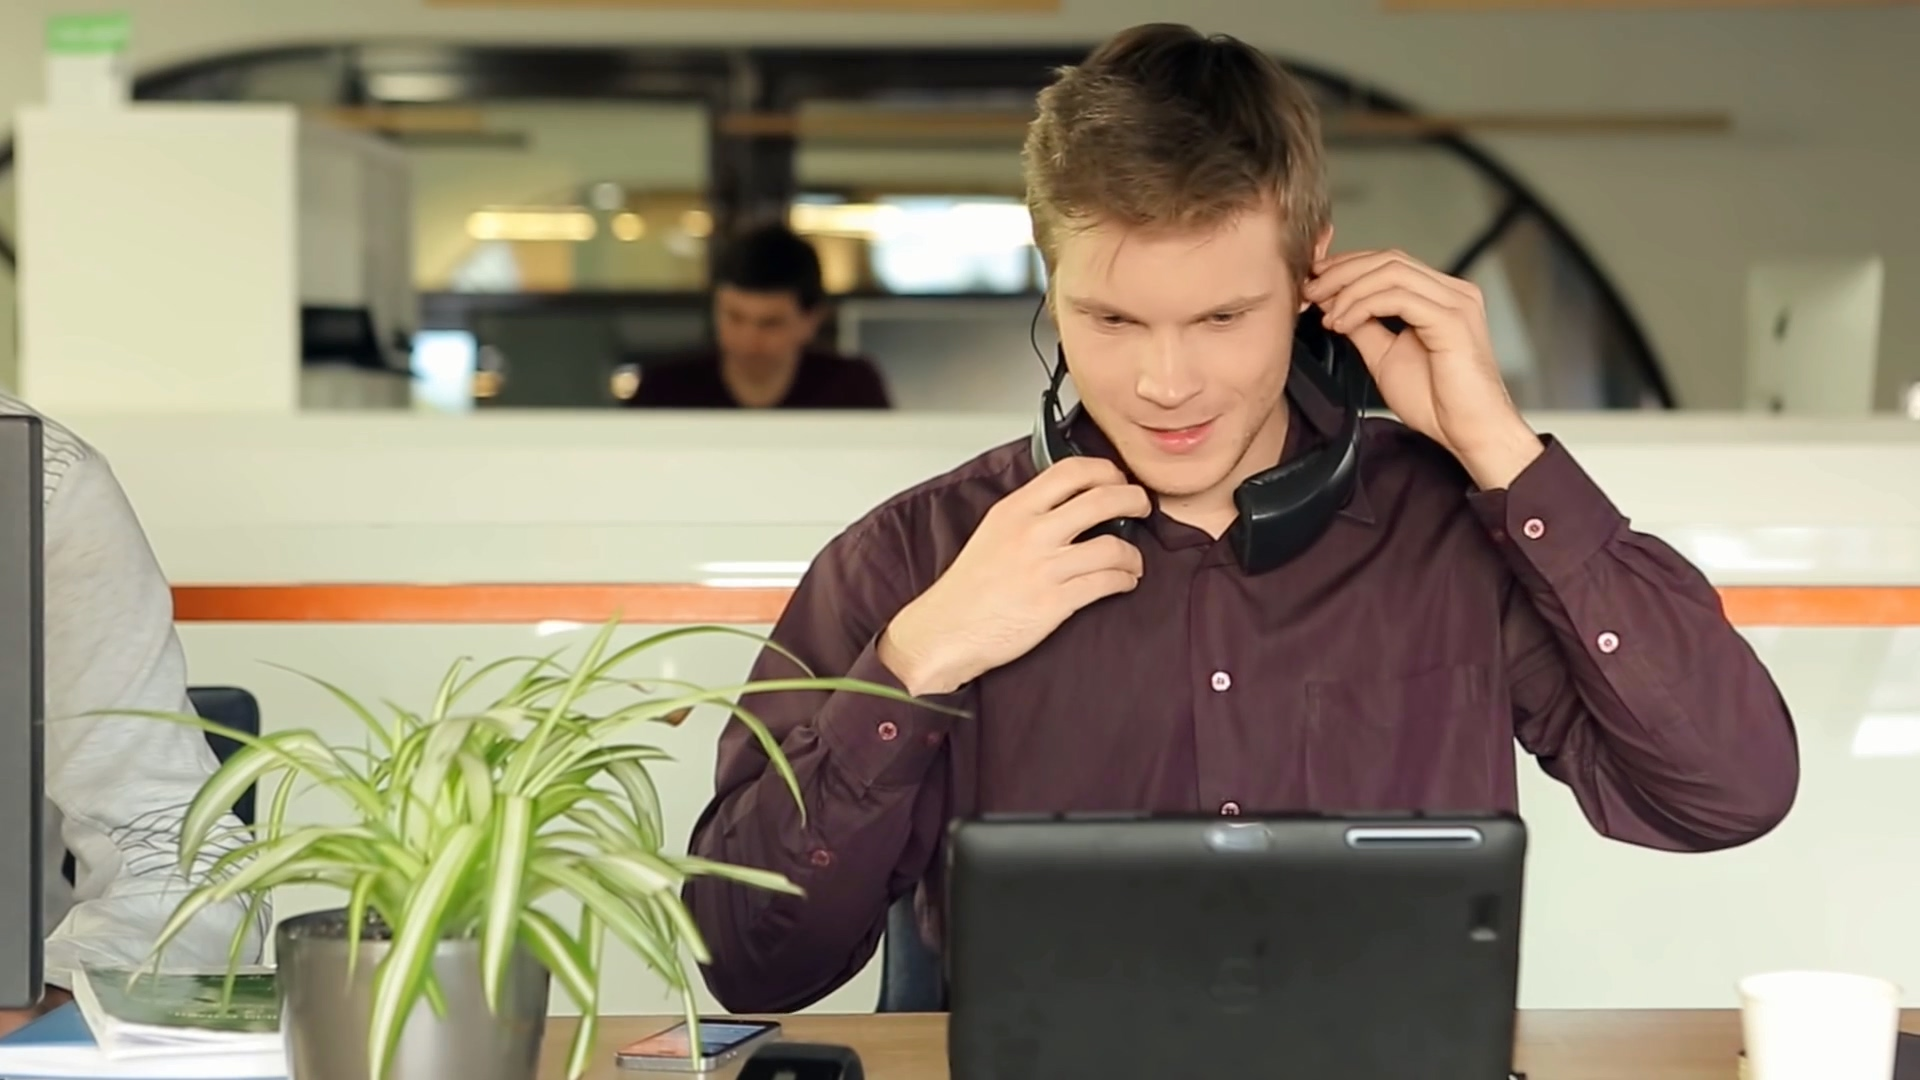 hush me voice masking mask for mobile phones (4)